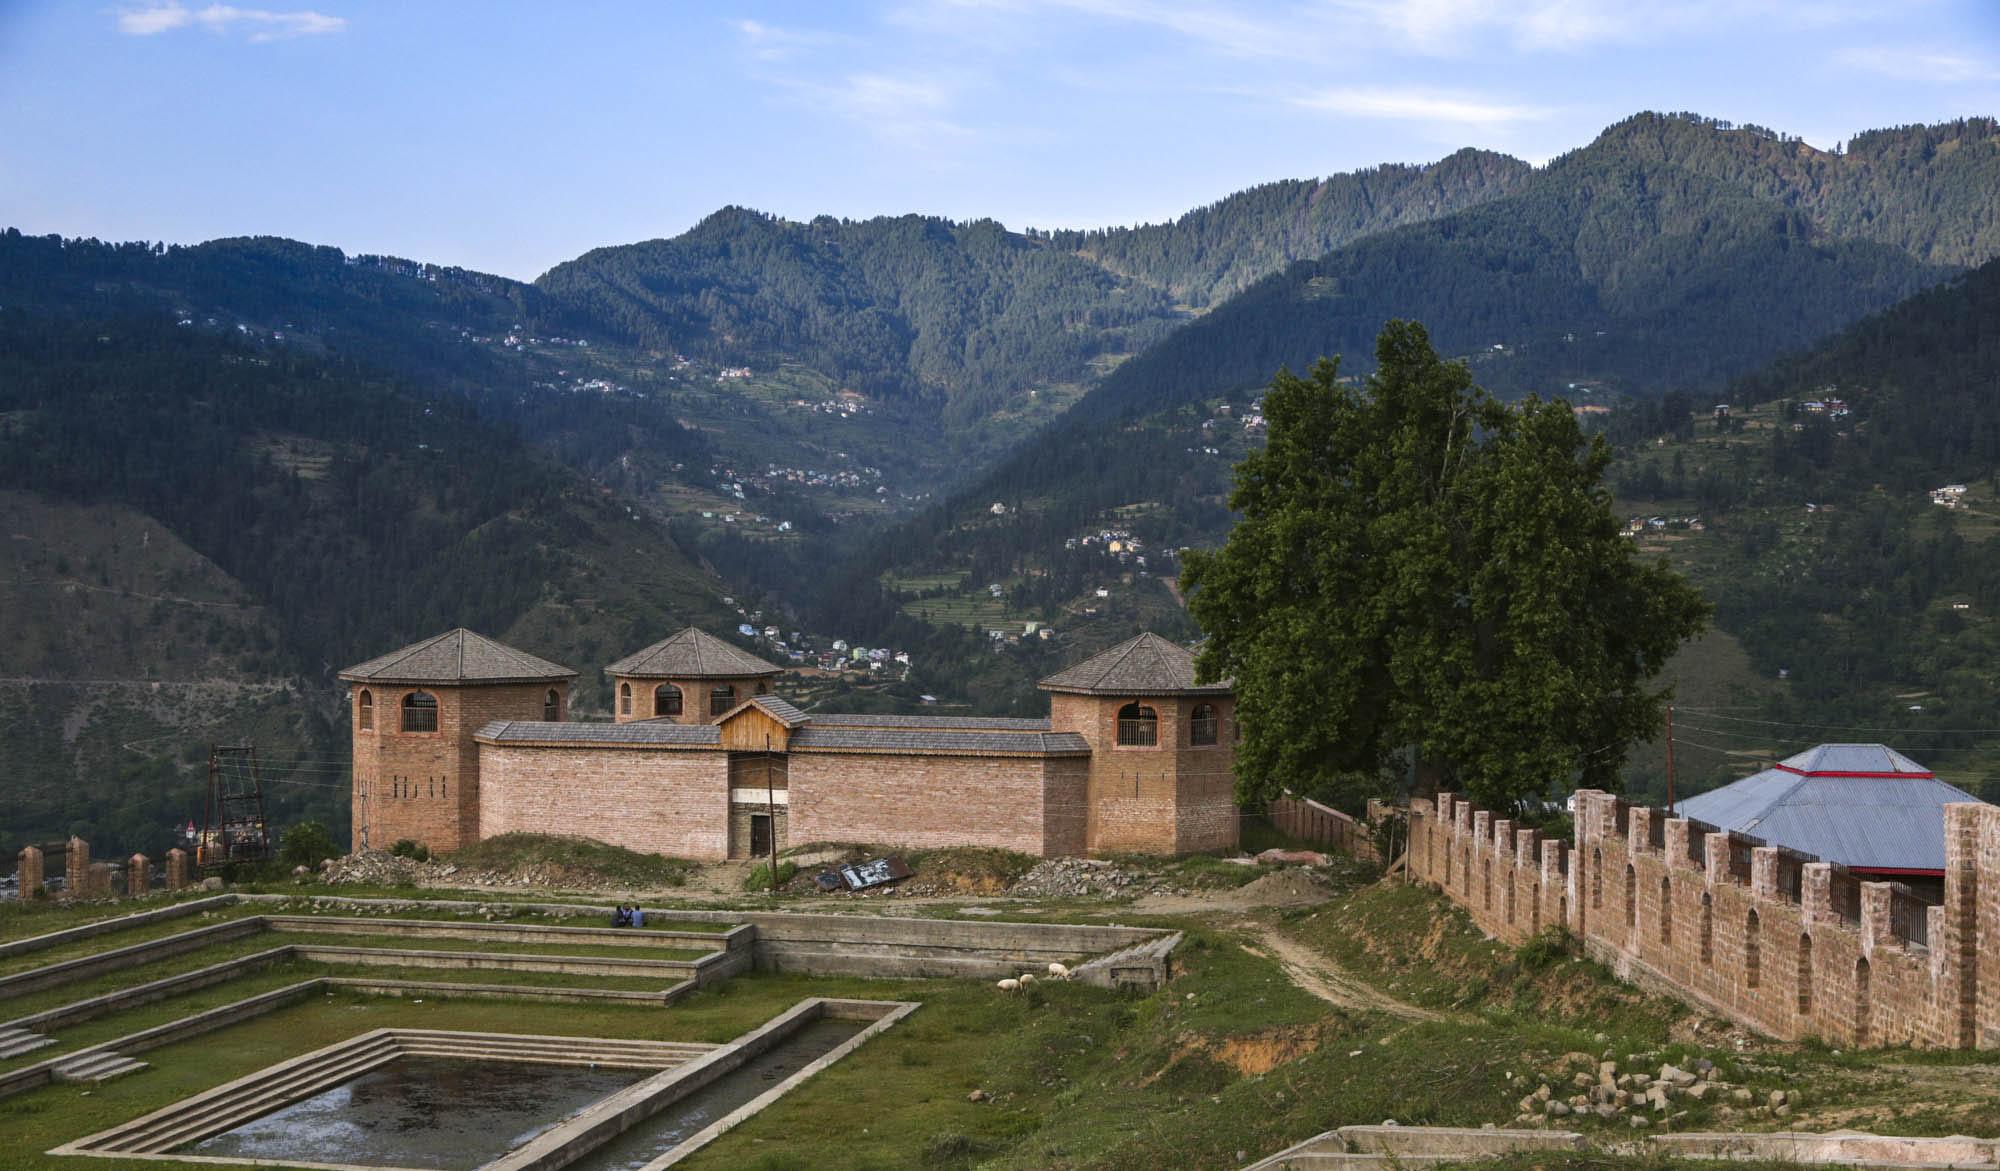 bhaderwah-fort-33